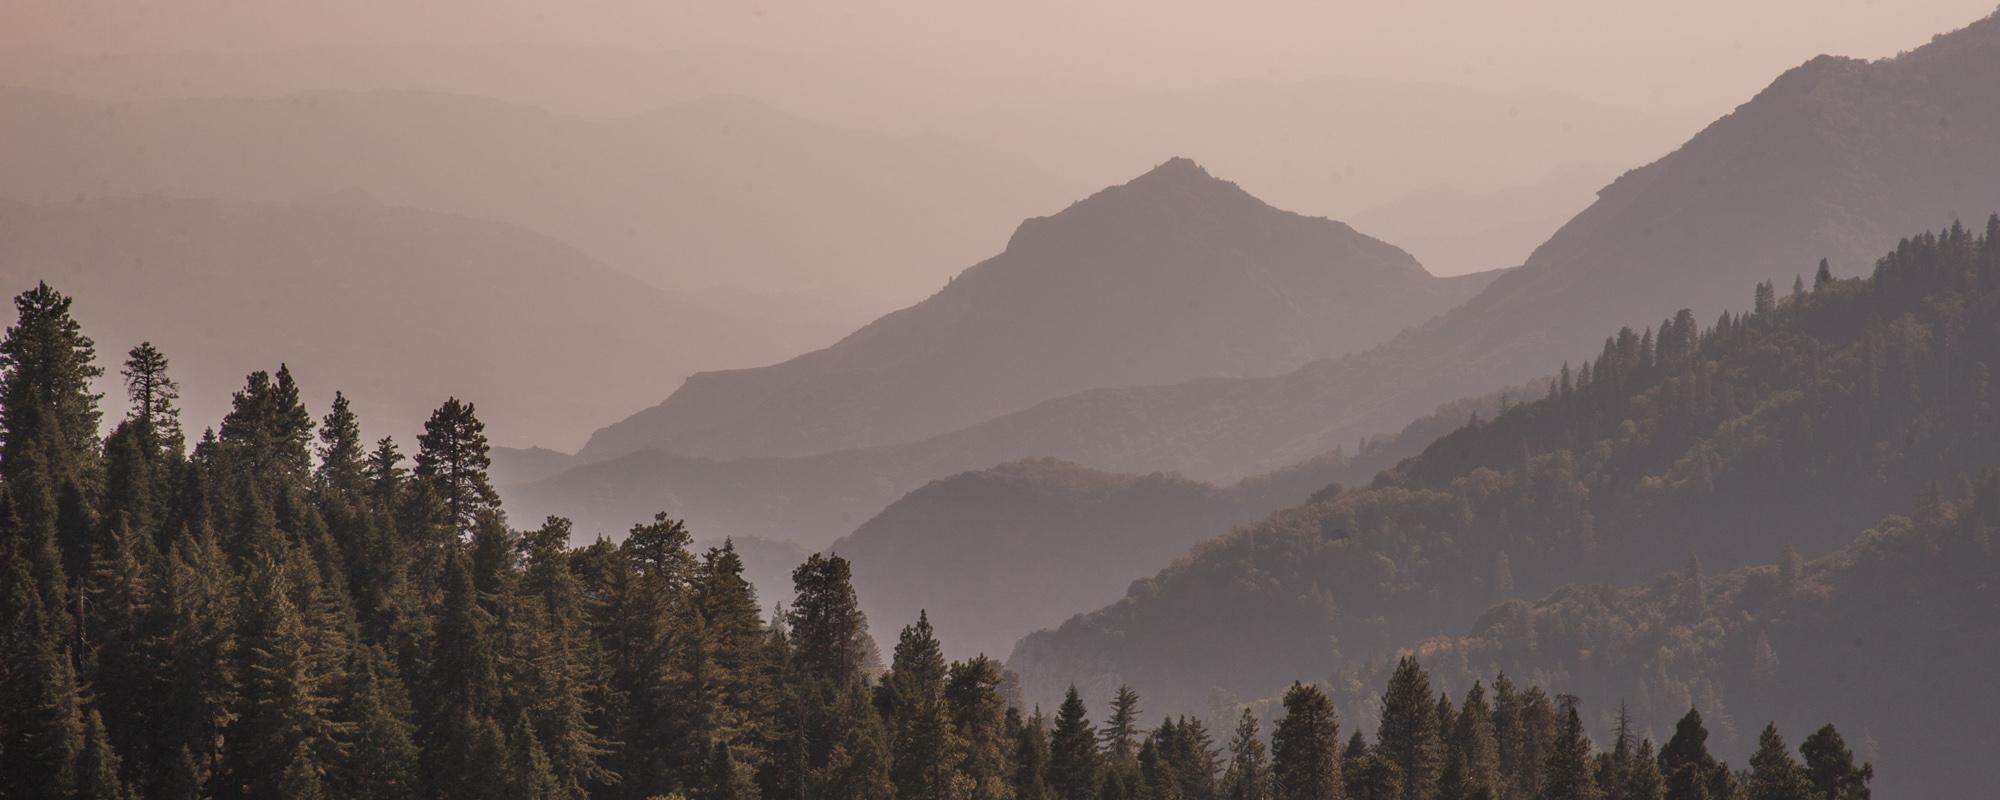 Mist over the Sierras